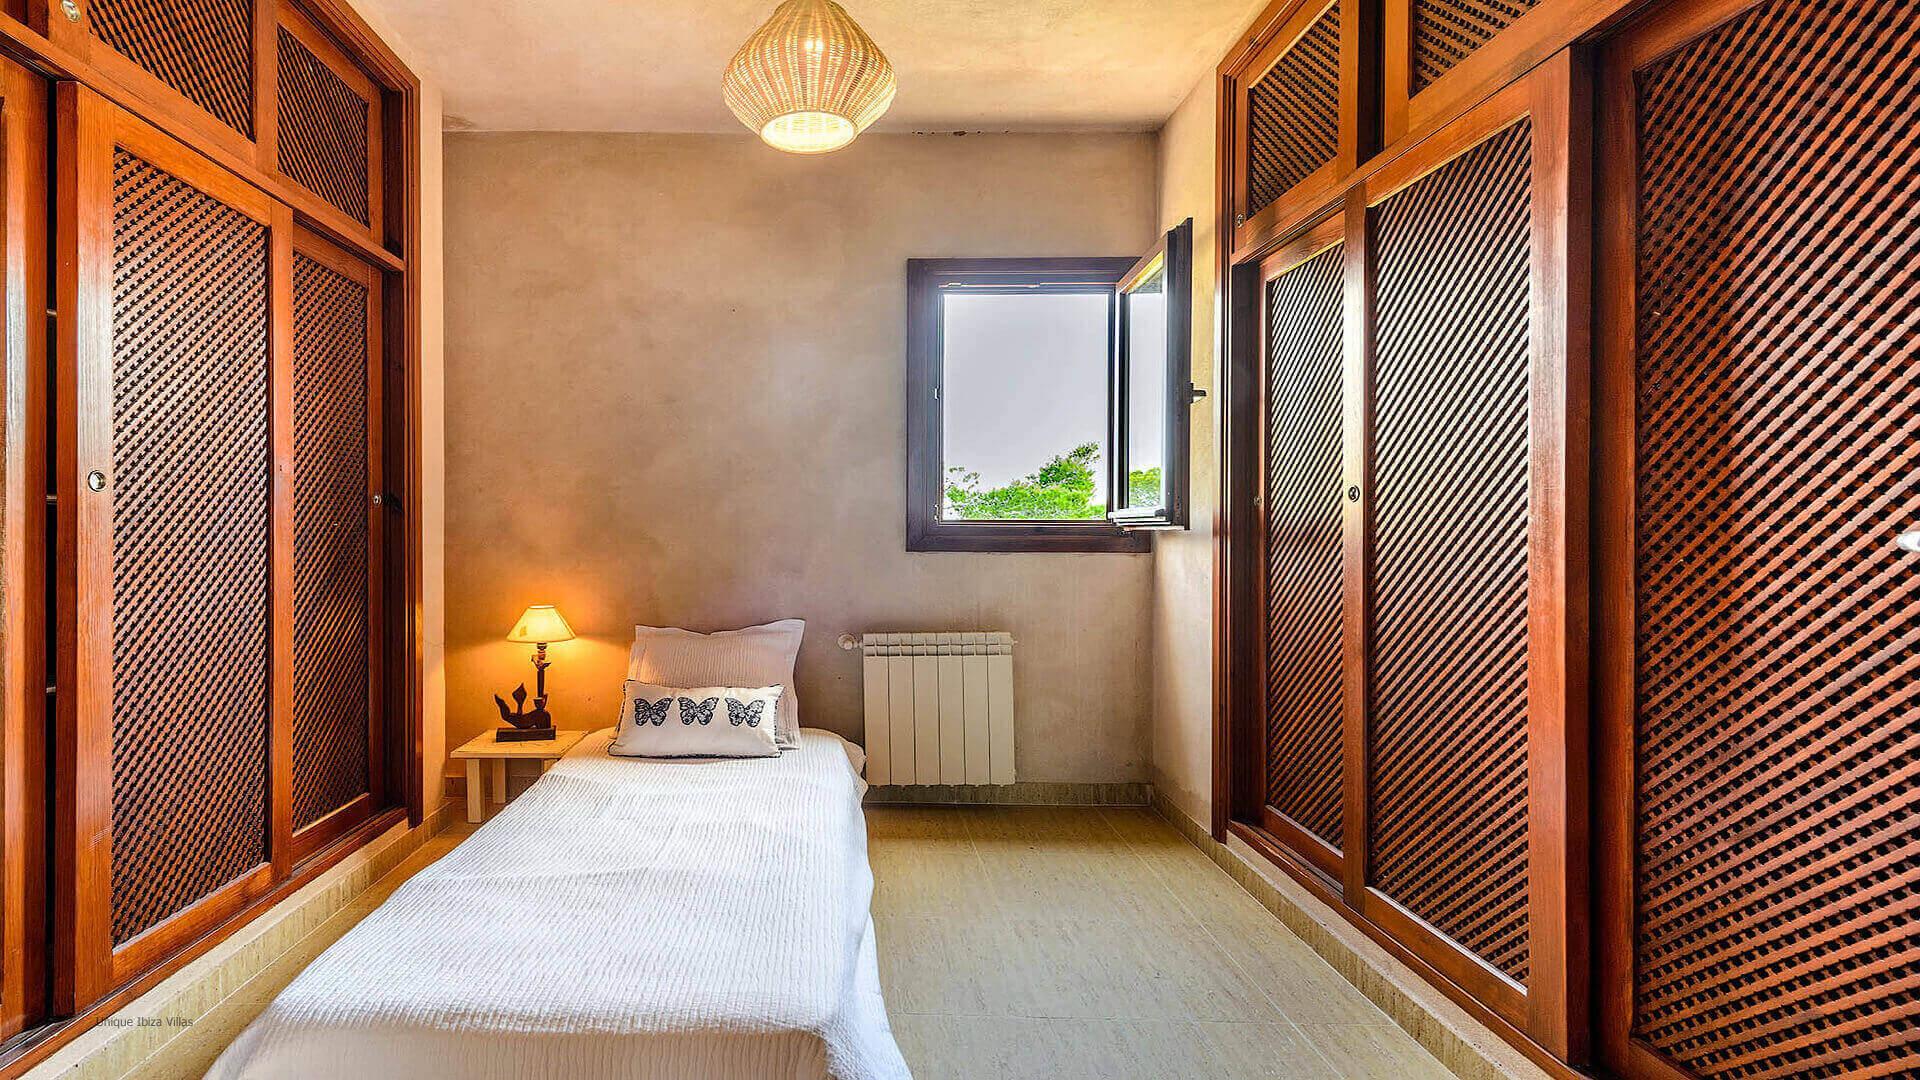 Villa Sa Boca Ibiza 30 Bedroom 1 Wardrobe Extra Bed